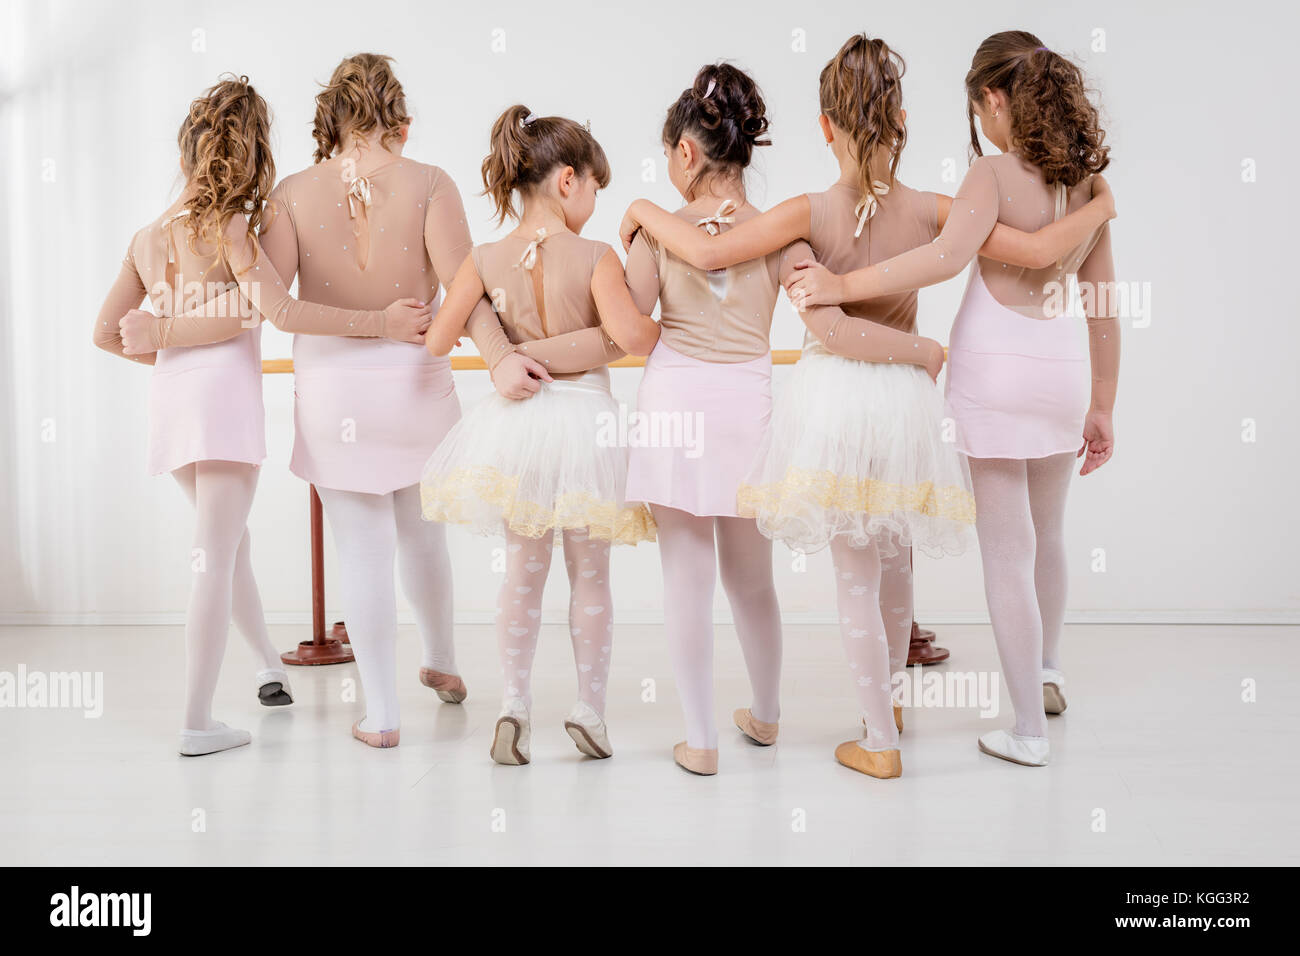 97f67f0ca9a4 Ballet Class Stock Photos   Ballet Class Stock Images - Alamy